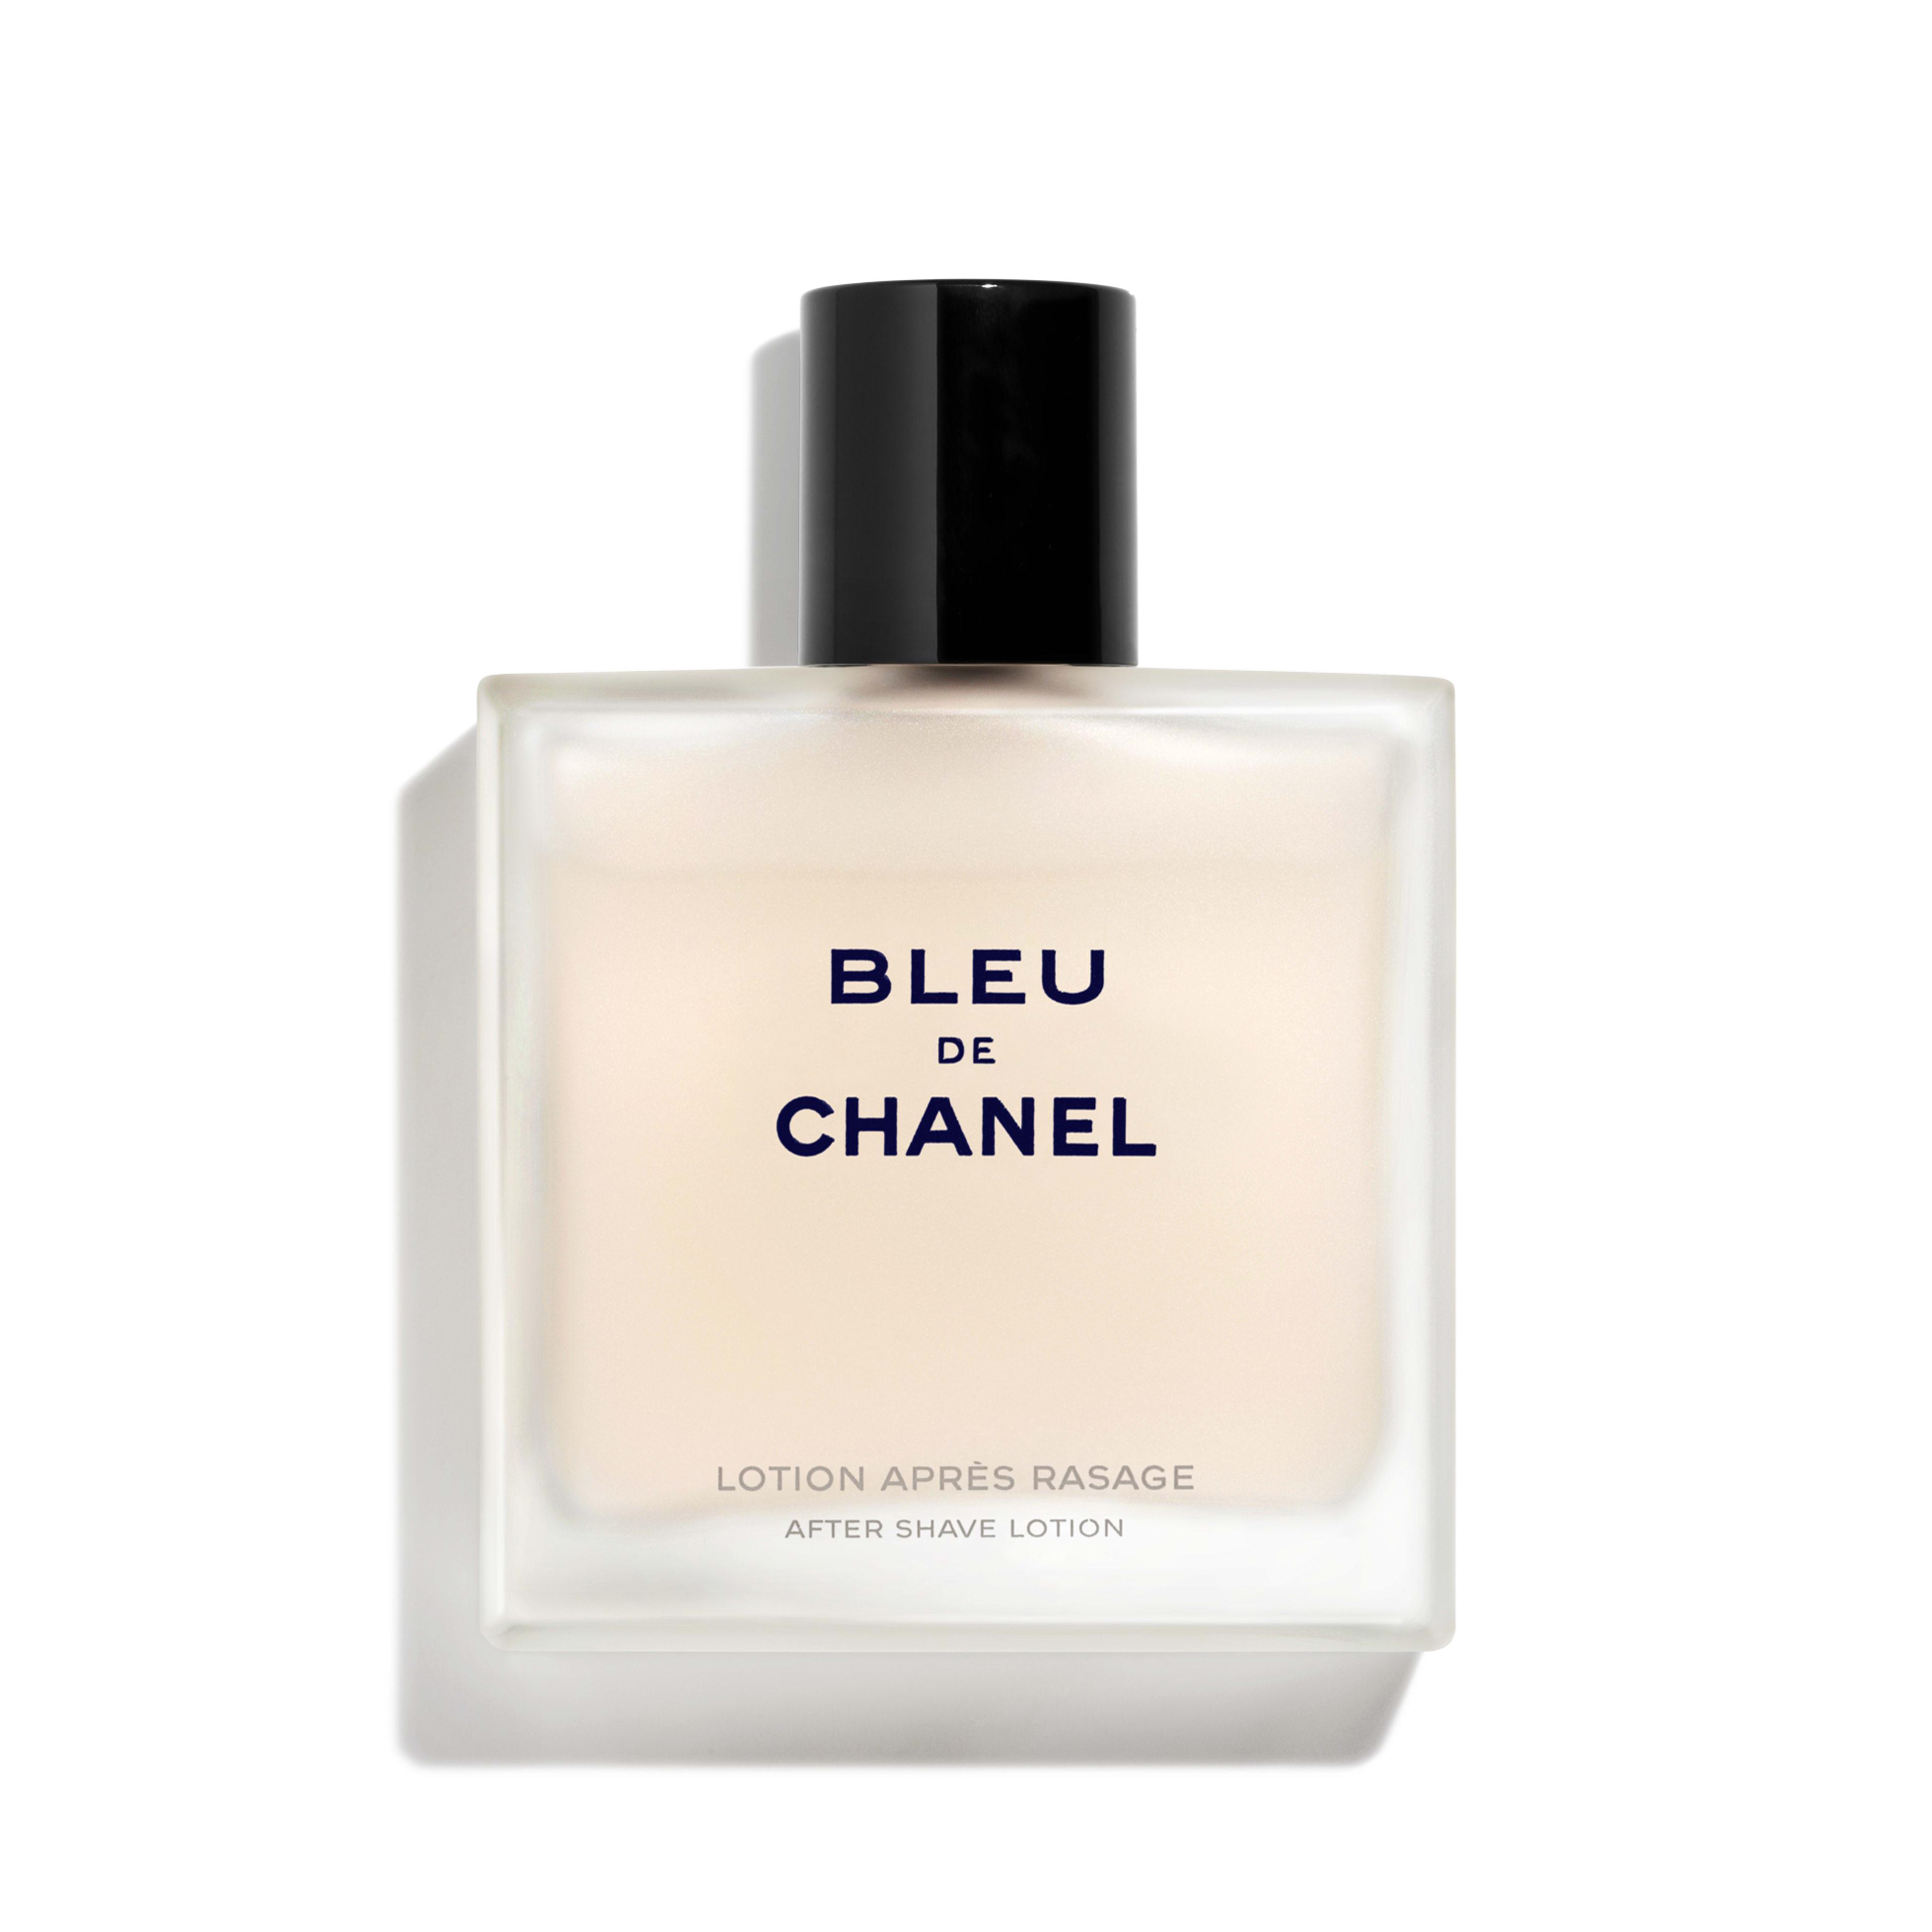 BLEU DE CHANEL - fragrance - 100ml - Вид по умолчанию